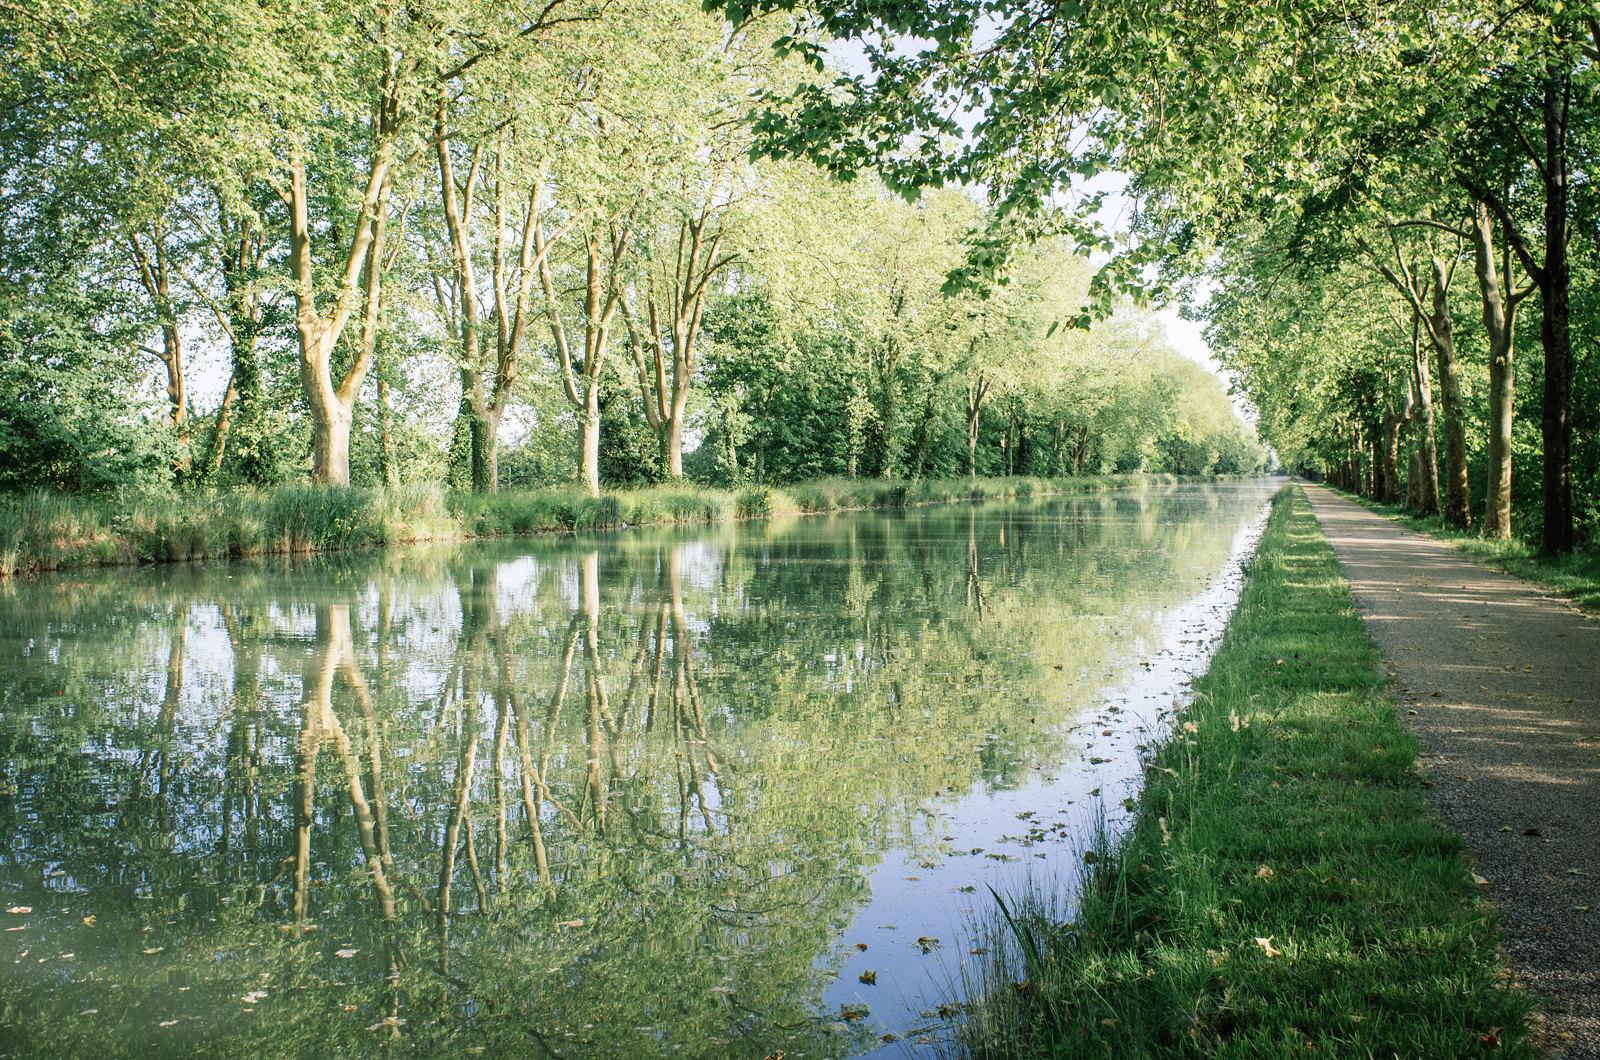 Le long du canal du midi - carnet de voyage en Tarn-et-Garonne